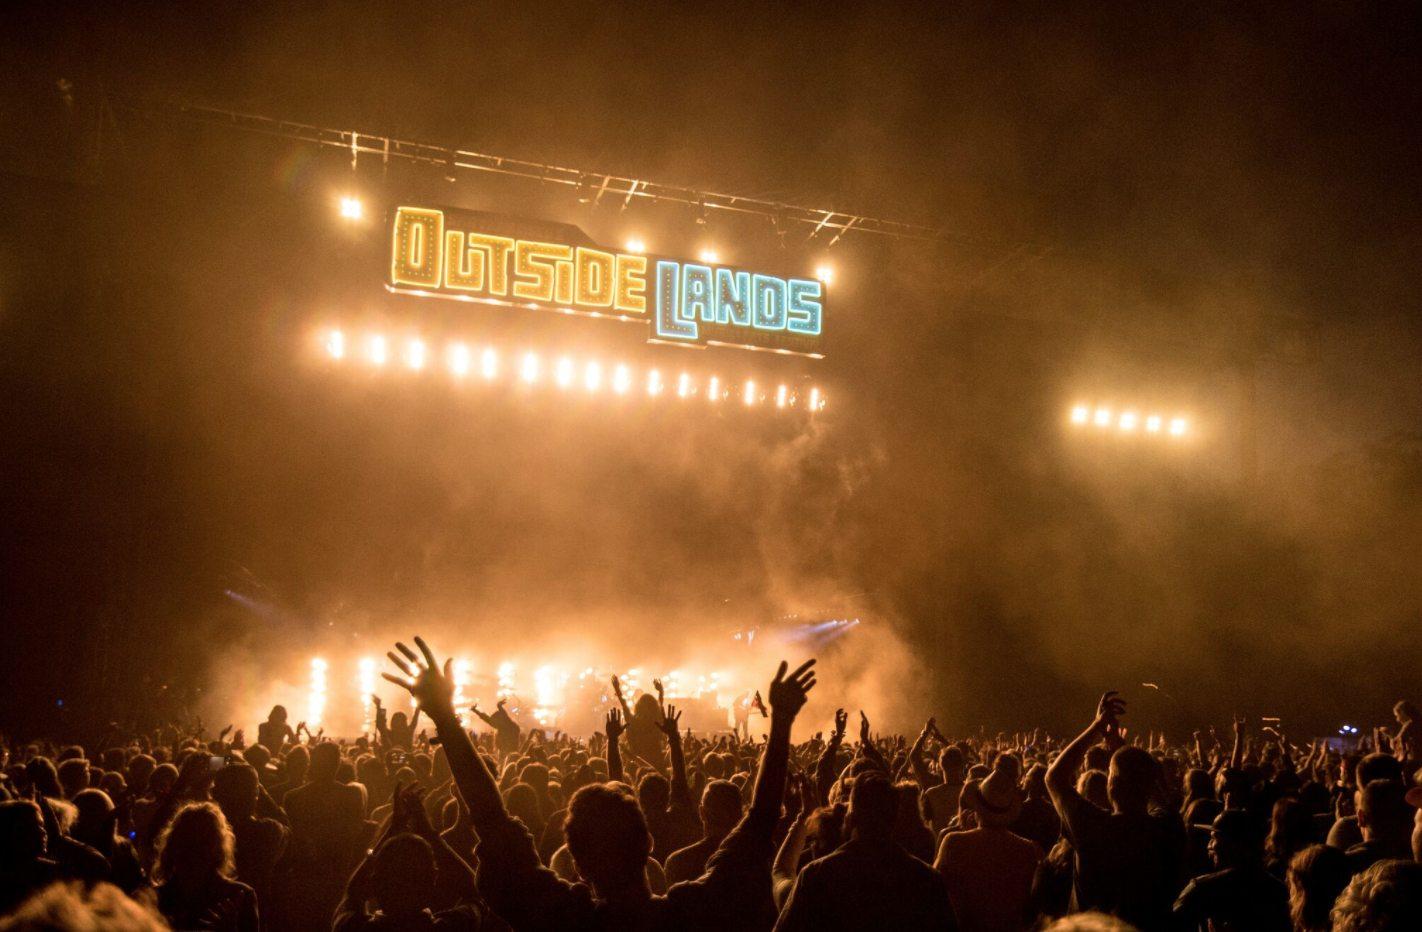 SF Music Festival Outside Lands Single Day Lineups